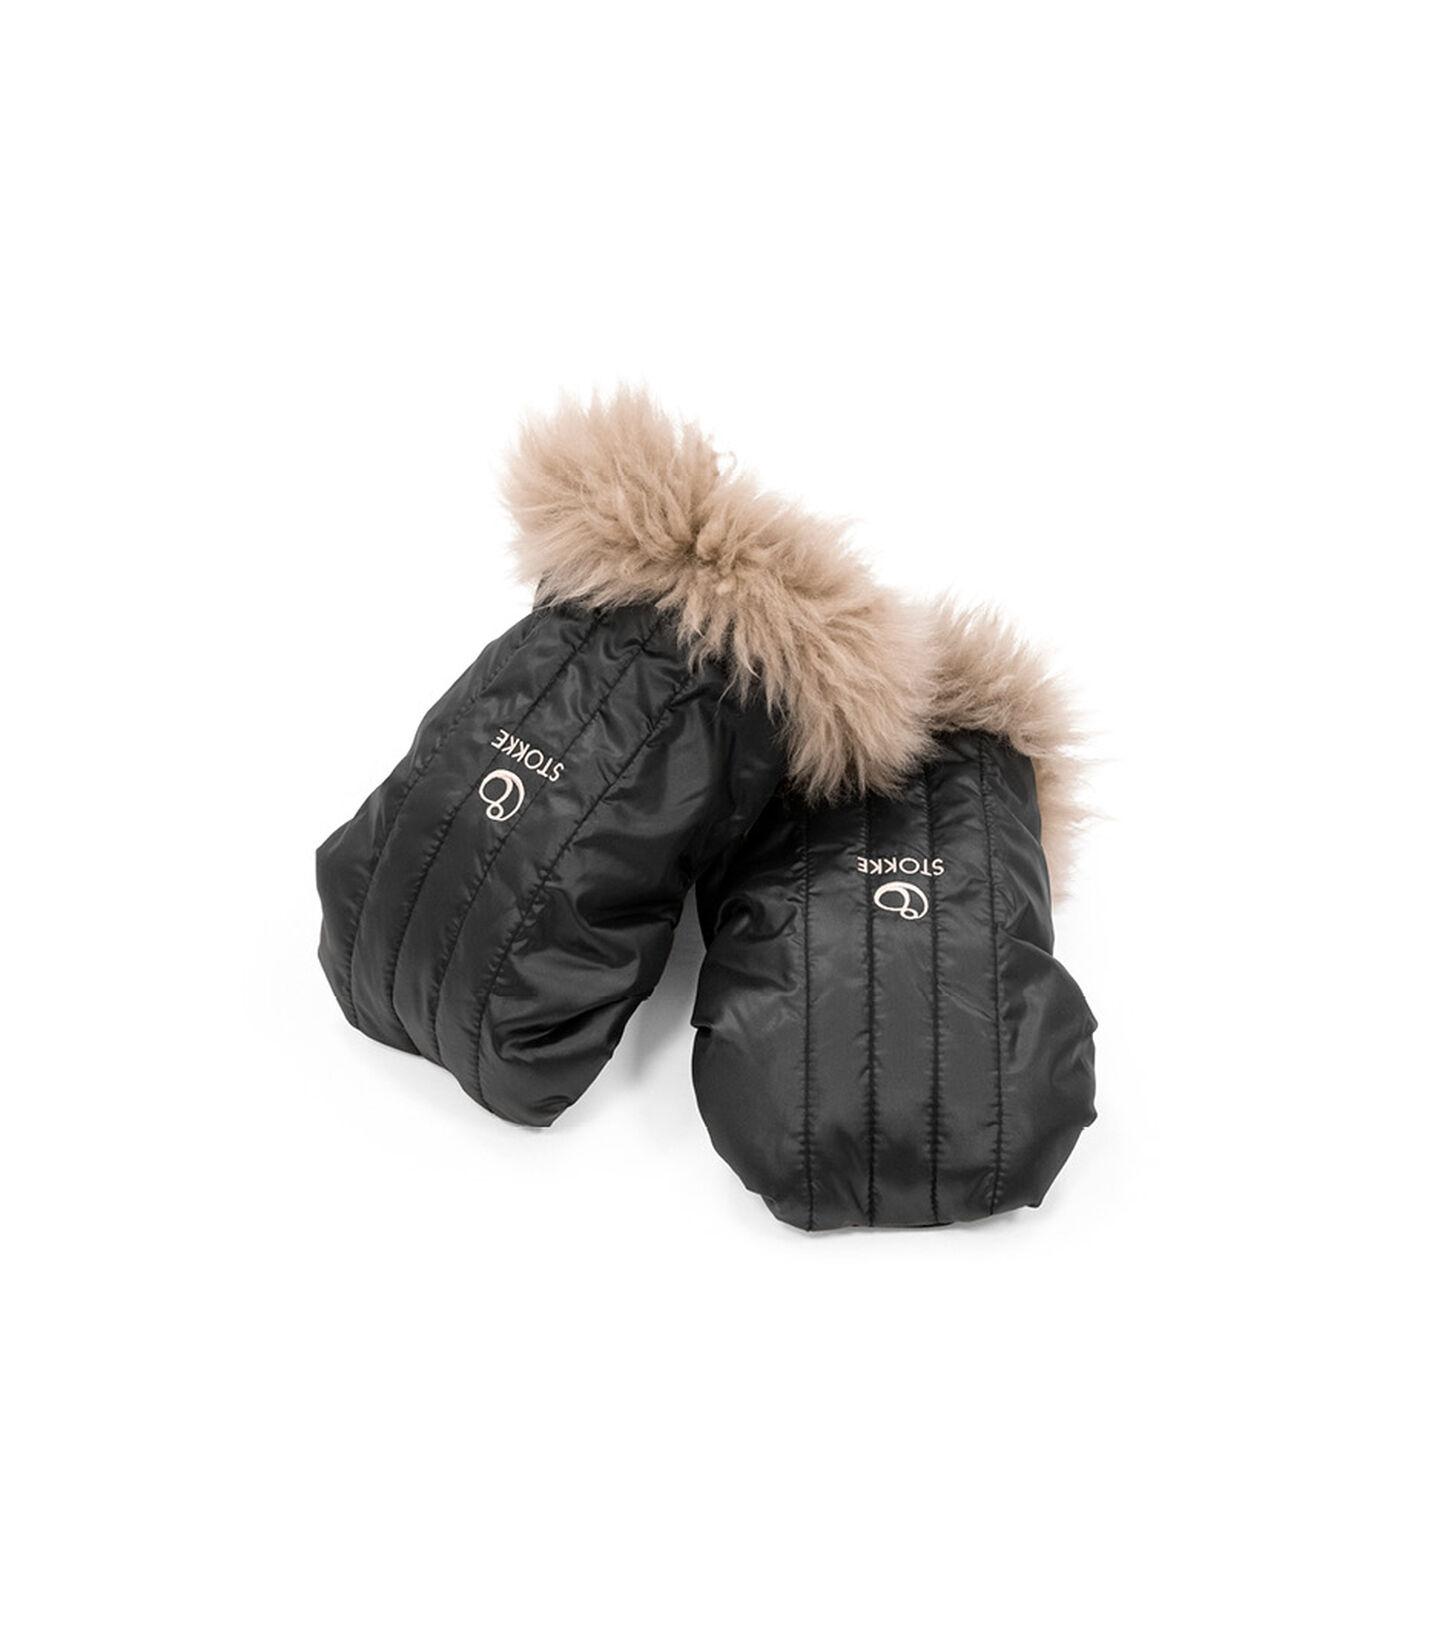 Stokke® Stroller Mittens Onyx Black, Onyx Black, mainview view 1